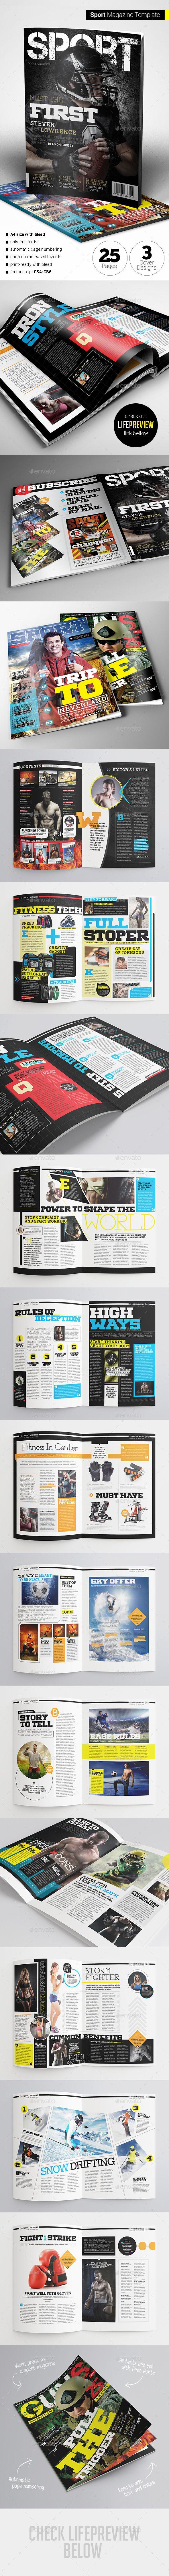 Sport Magazine Template #design Download: http://graphicriver.net/item/sport-magazine/11761550?ref=ksioks